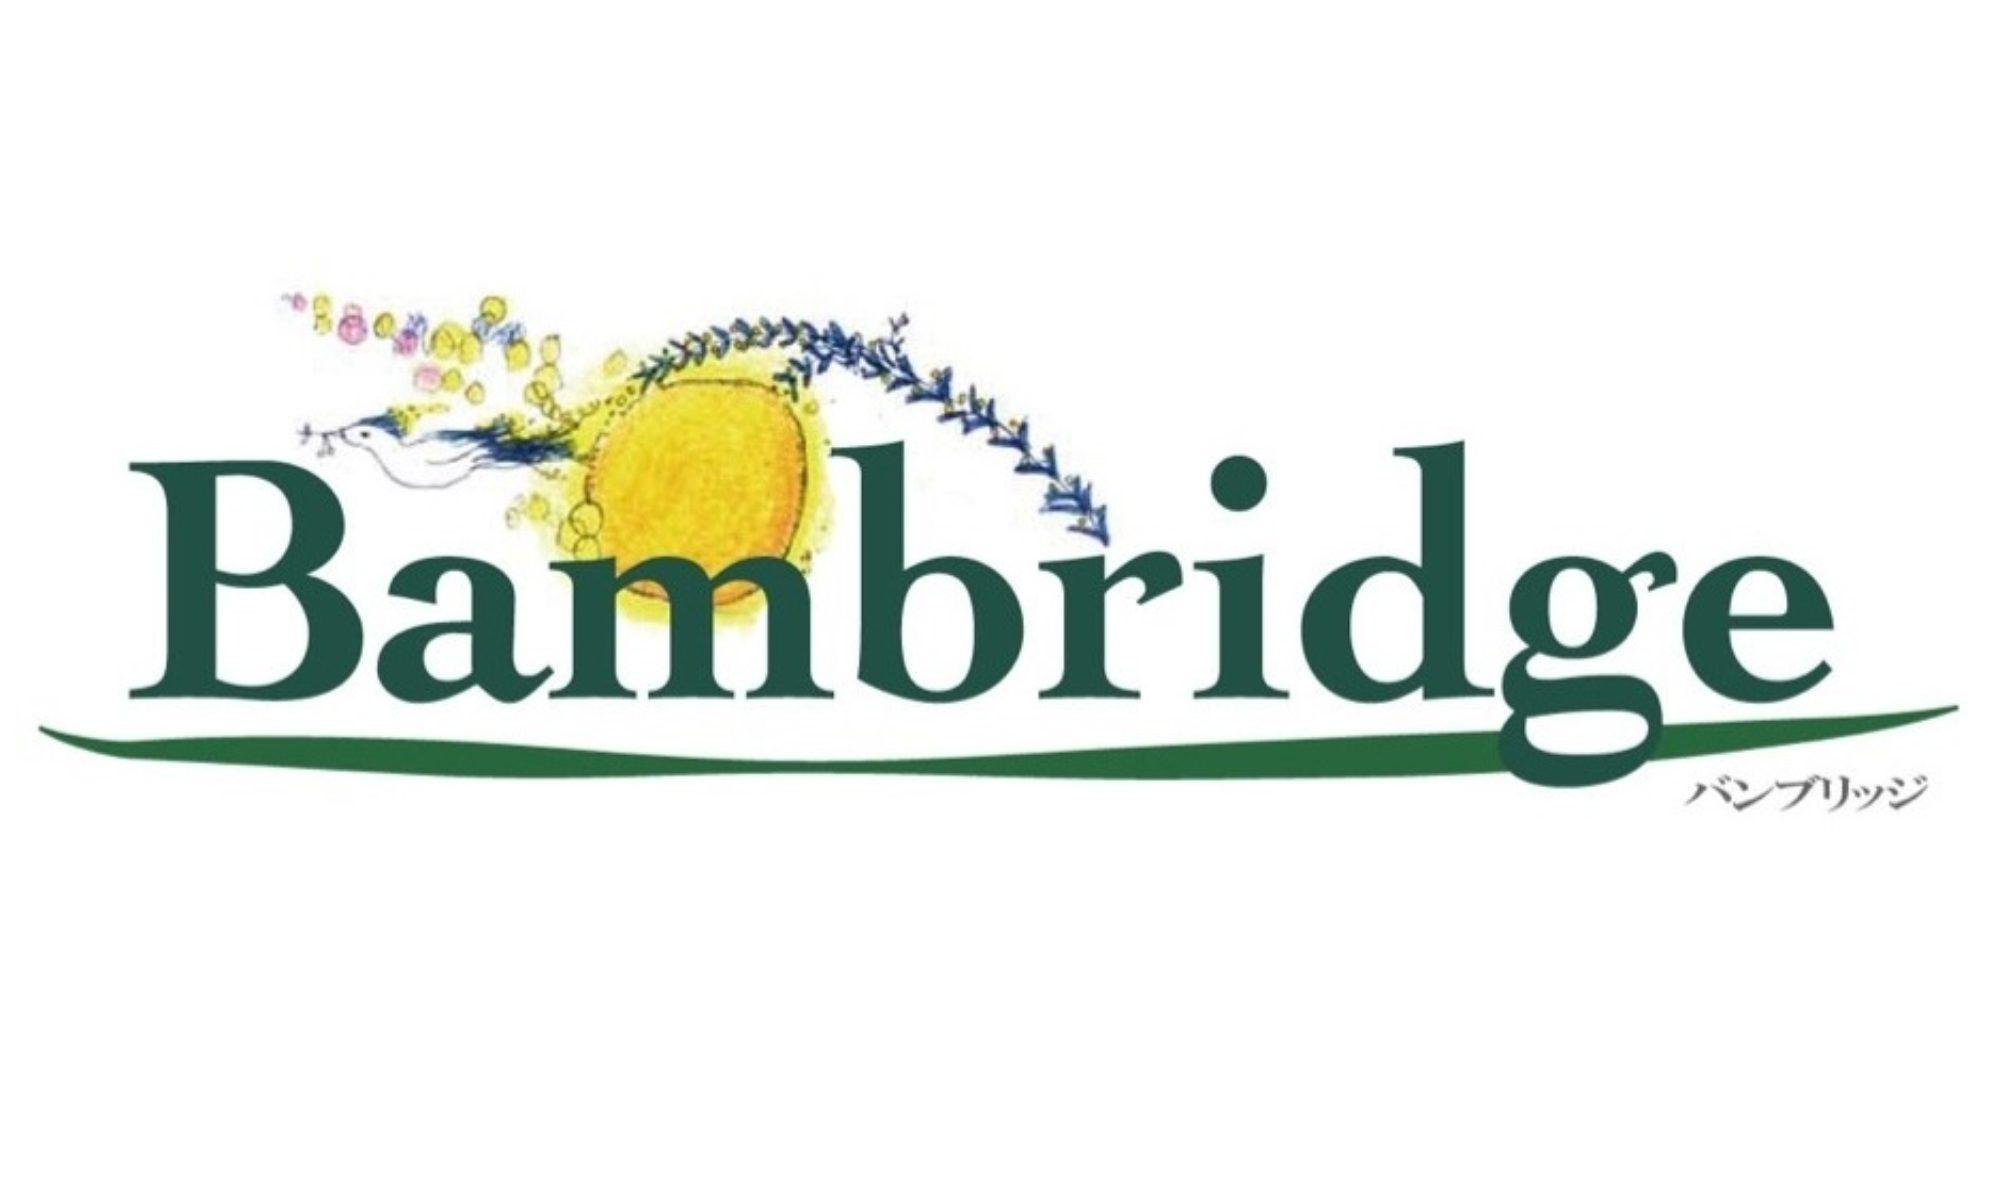 Bambridge(バンブリッジ)Official WebSite